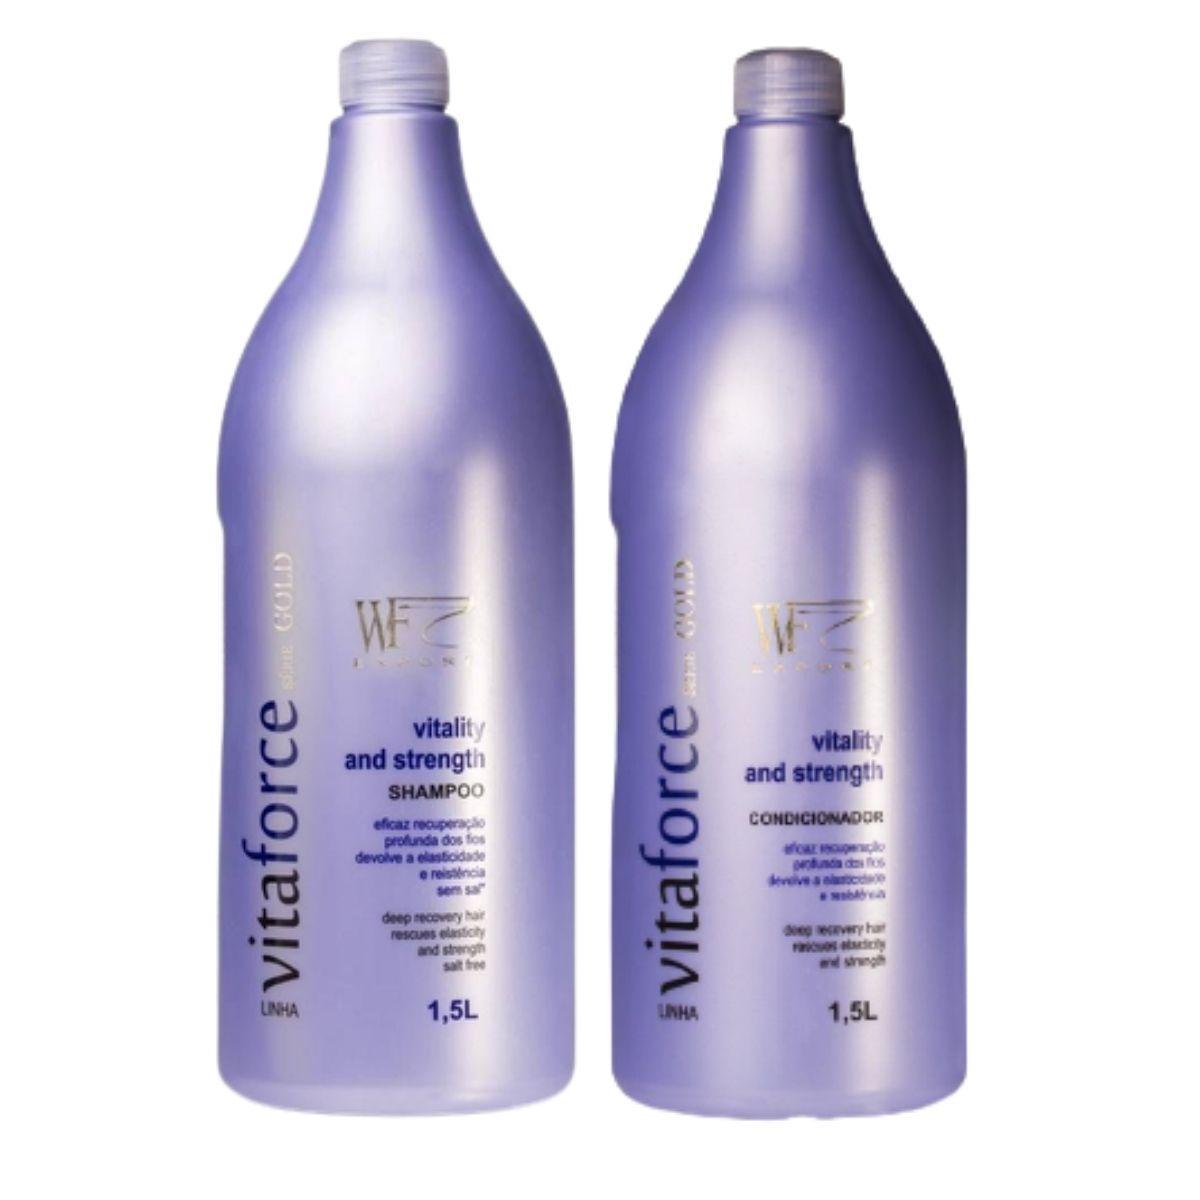 Kit Wf Cosméticos Vitaforce Duo Professional (2 Produtos)